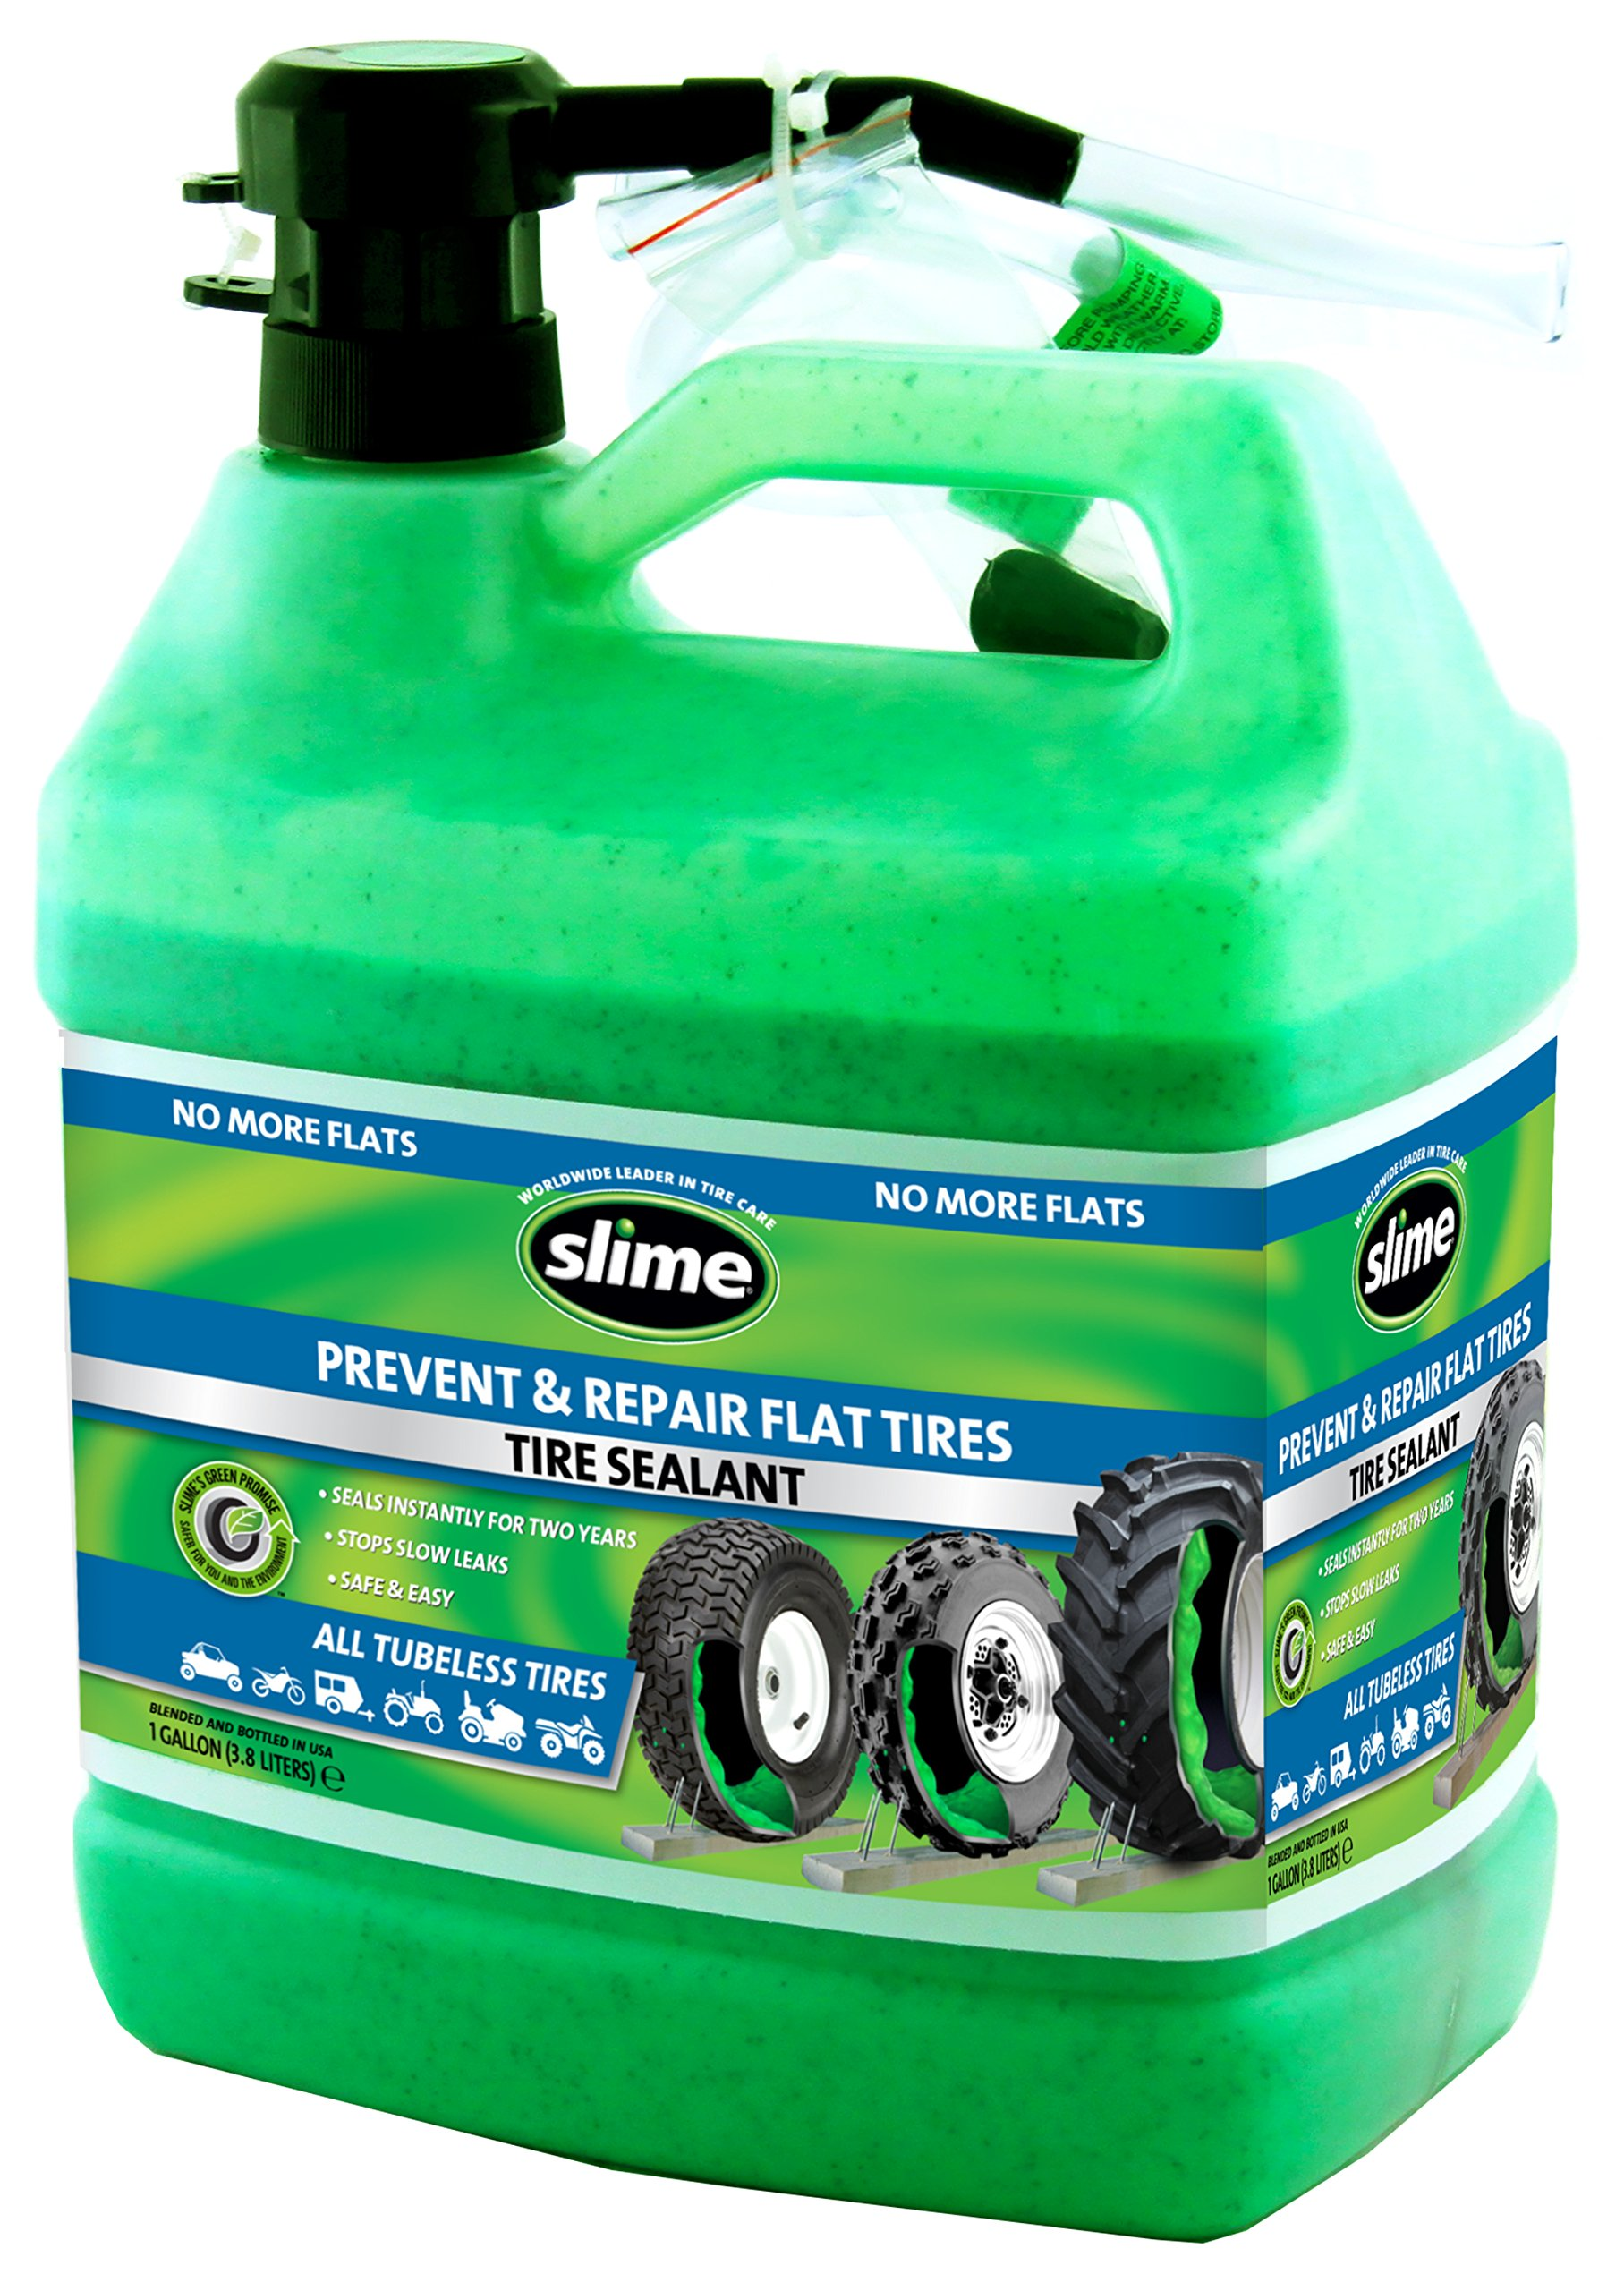 Slime 10163 Automotive Accessories, 128. Fluid_Ounces by Slime